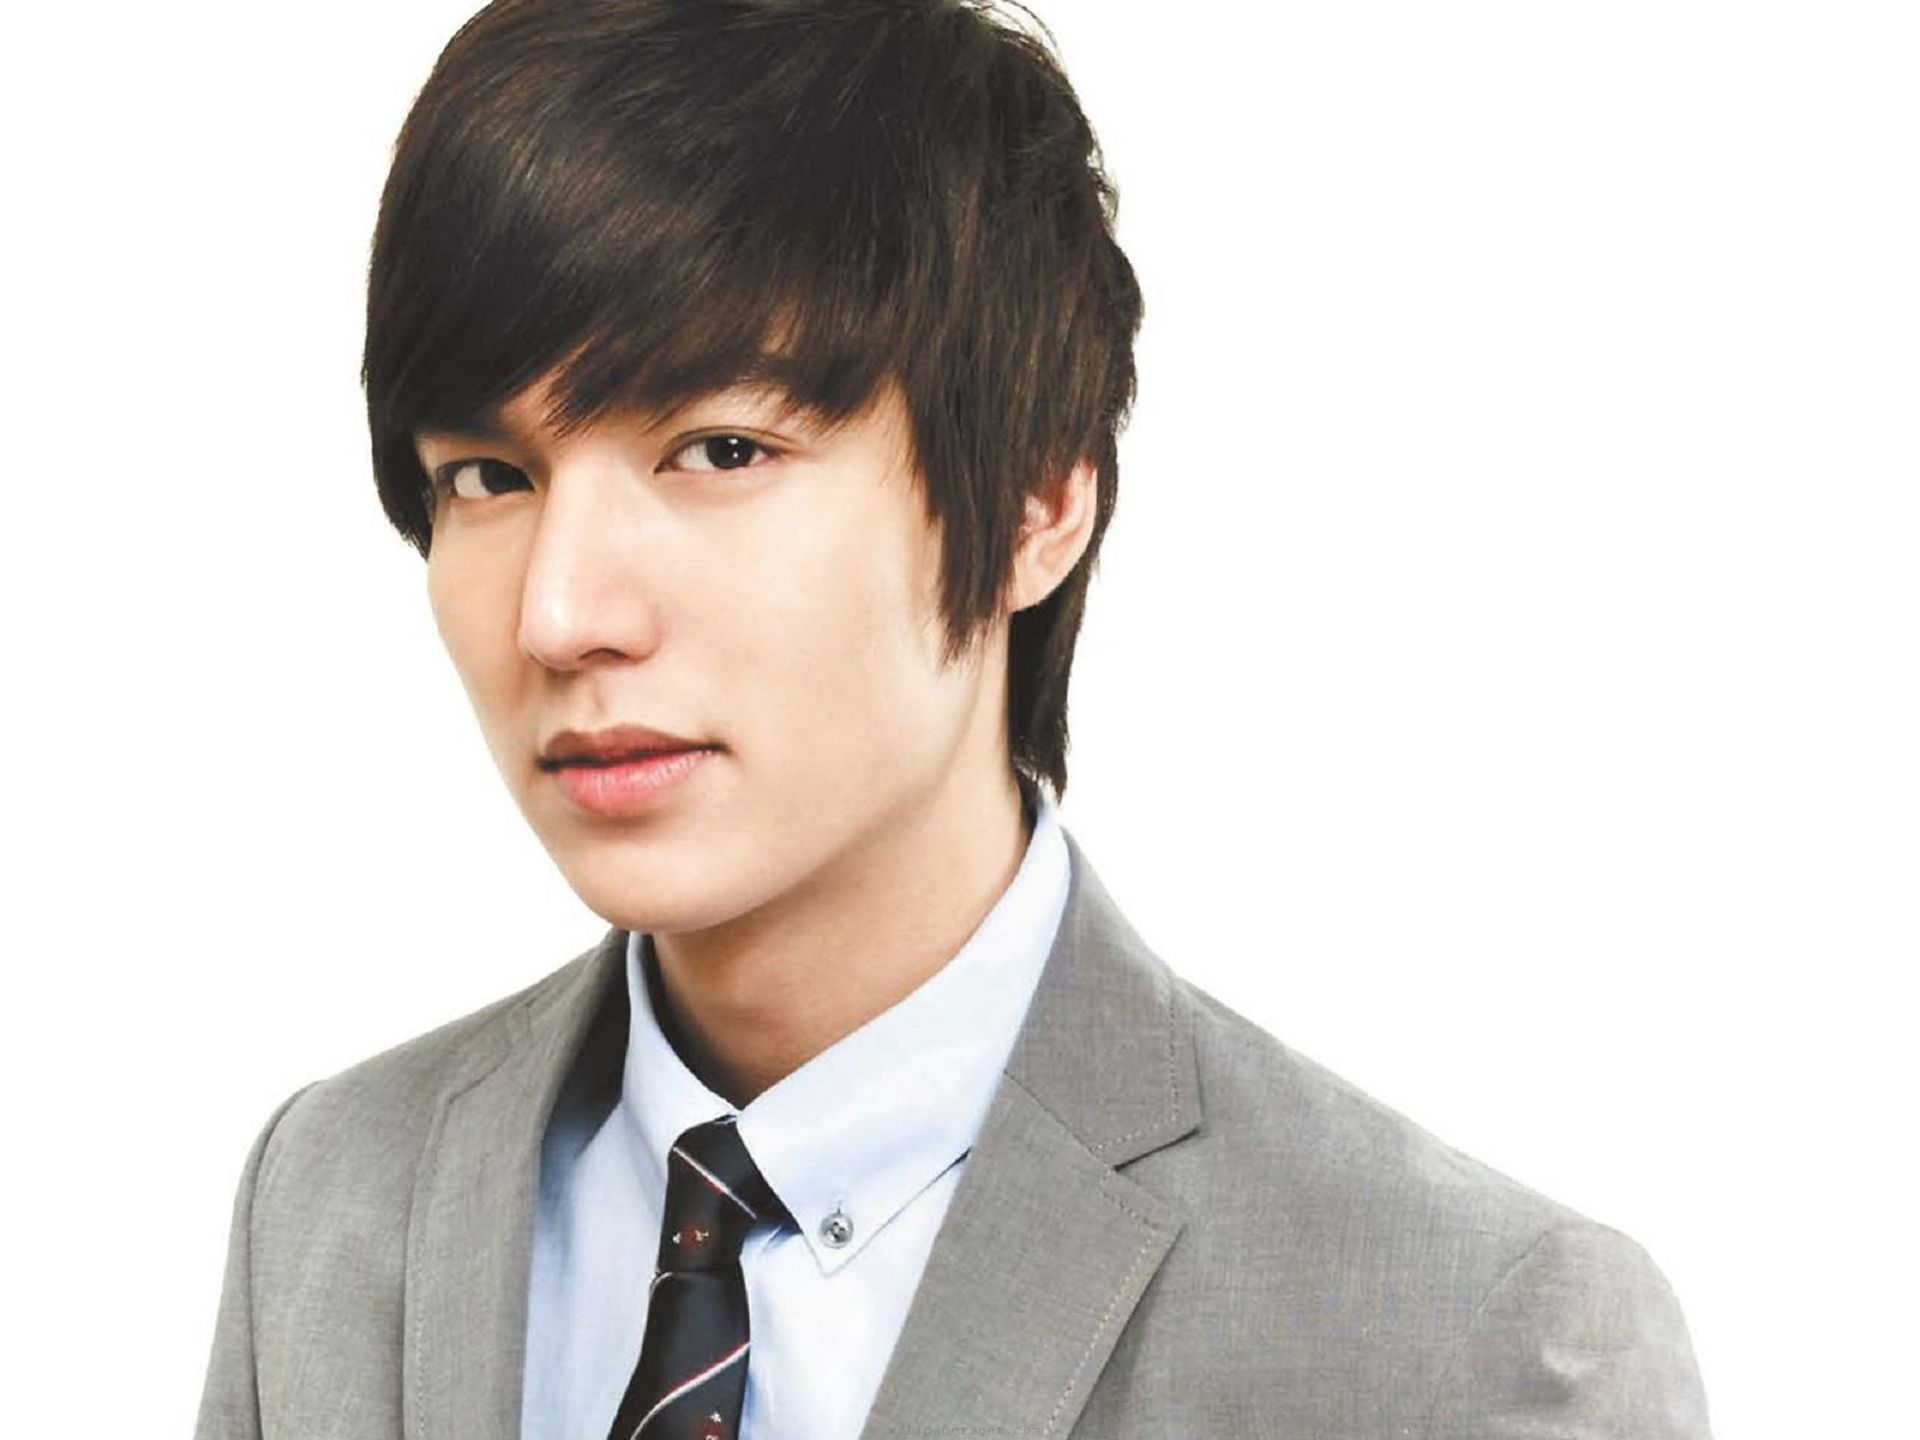 Lee Min Ho Wallpaper Download Lee Min Ho Wallpaper Android Lee Min Ho Pics Lee Min Lee Min Ho